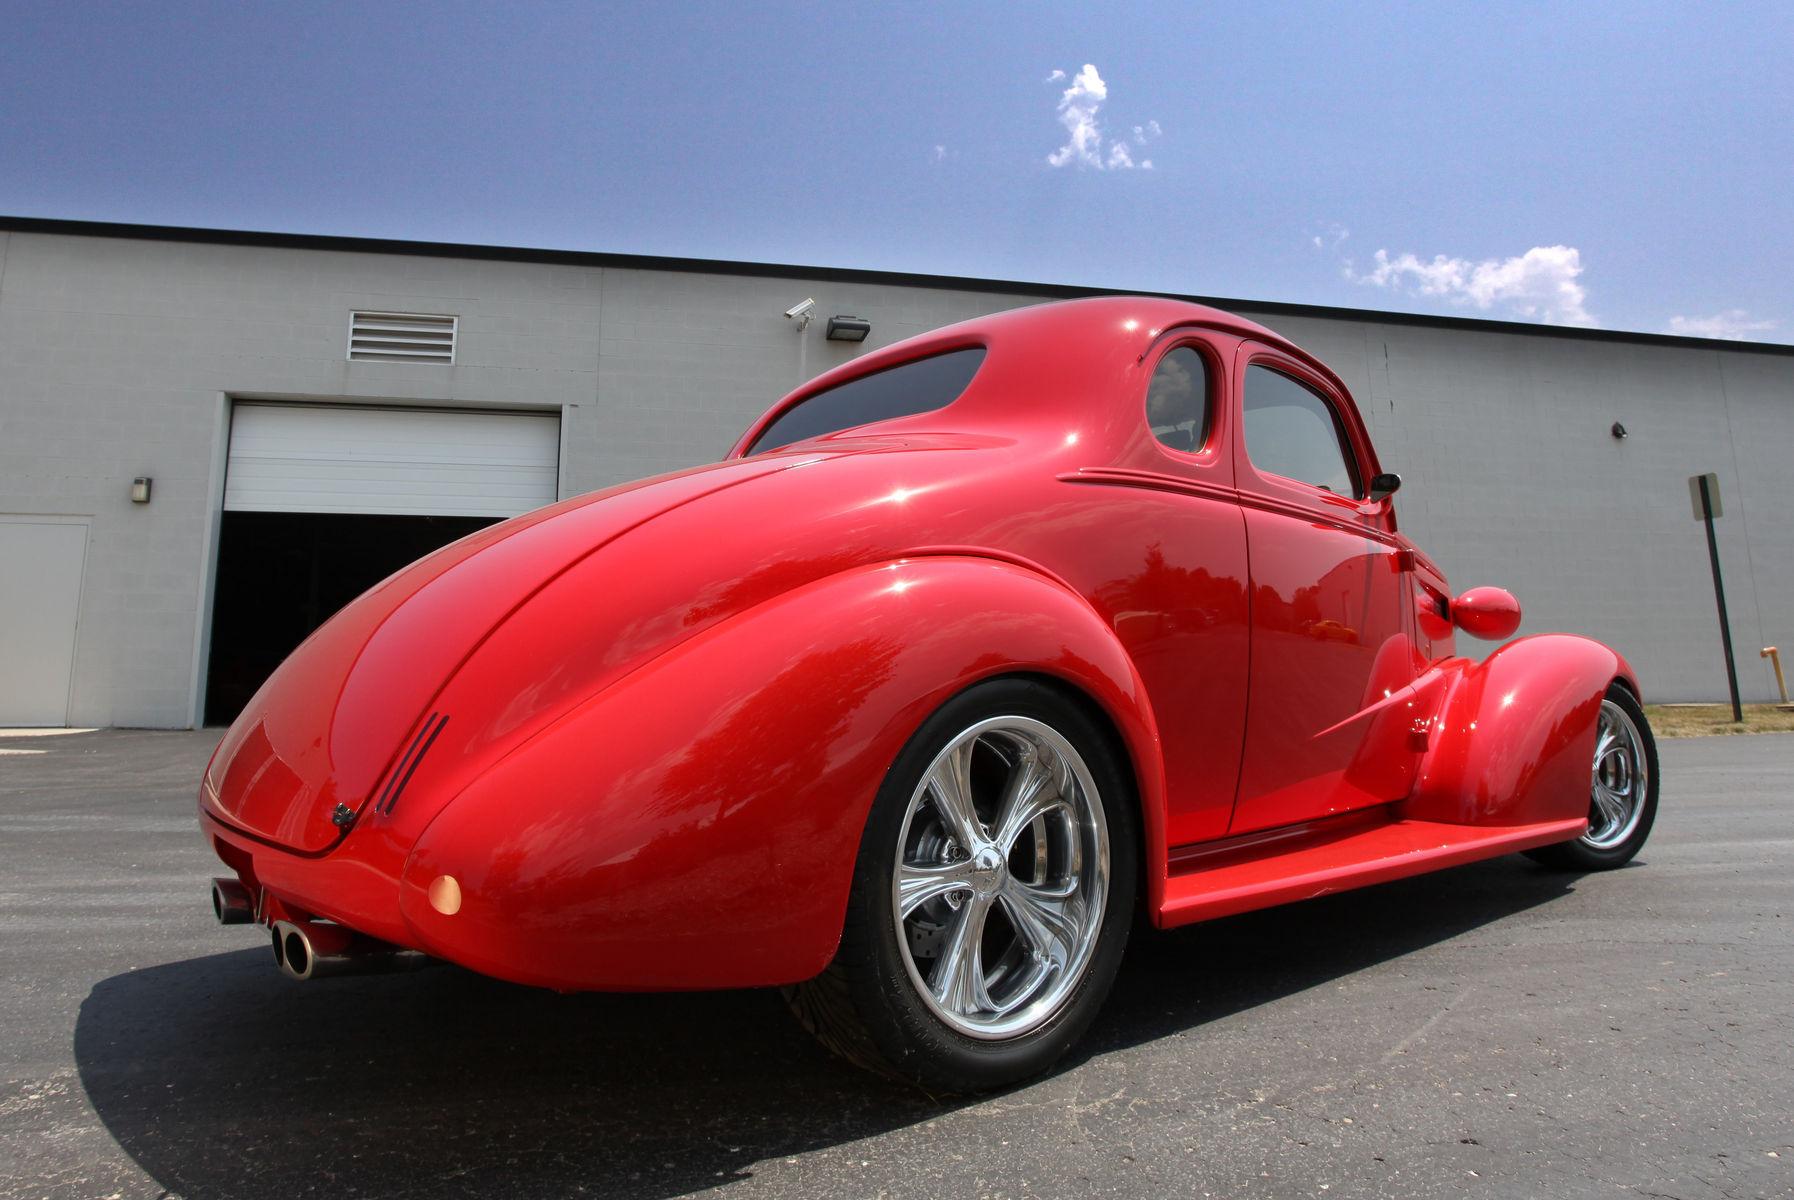 1938 Chevrolet Classic | 1938 Chevrolet Special Custom - Rear 2